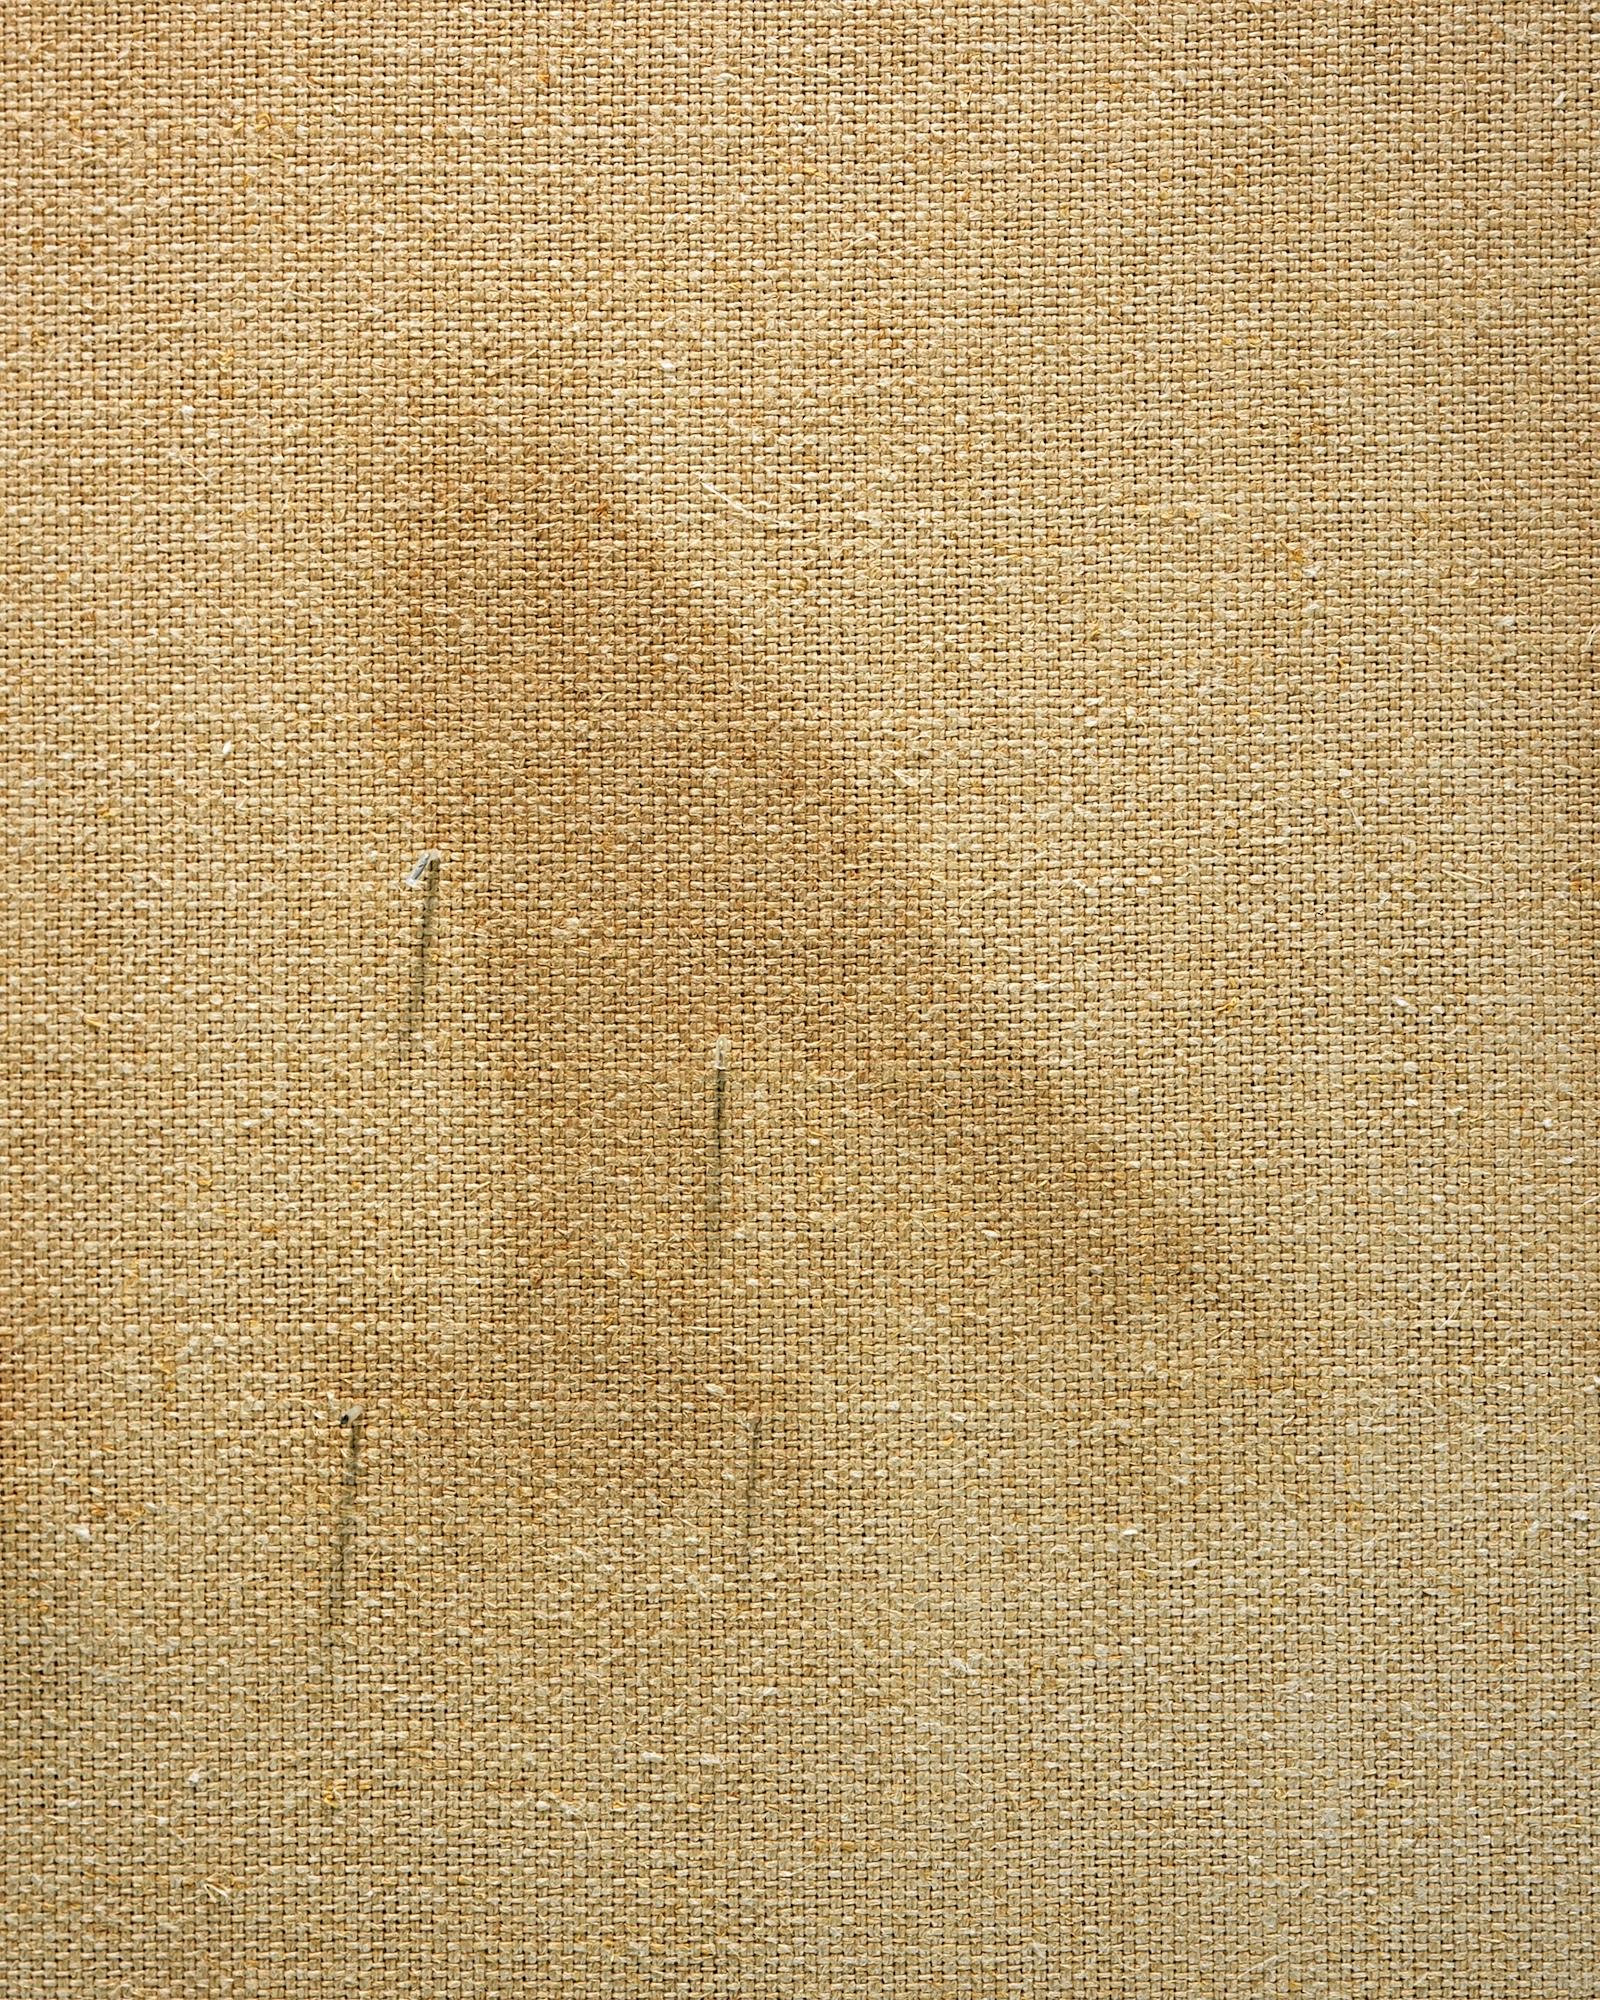 The Metropolitan Museum of Art-4, archival pigment print,14 x 11 inches, 2013